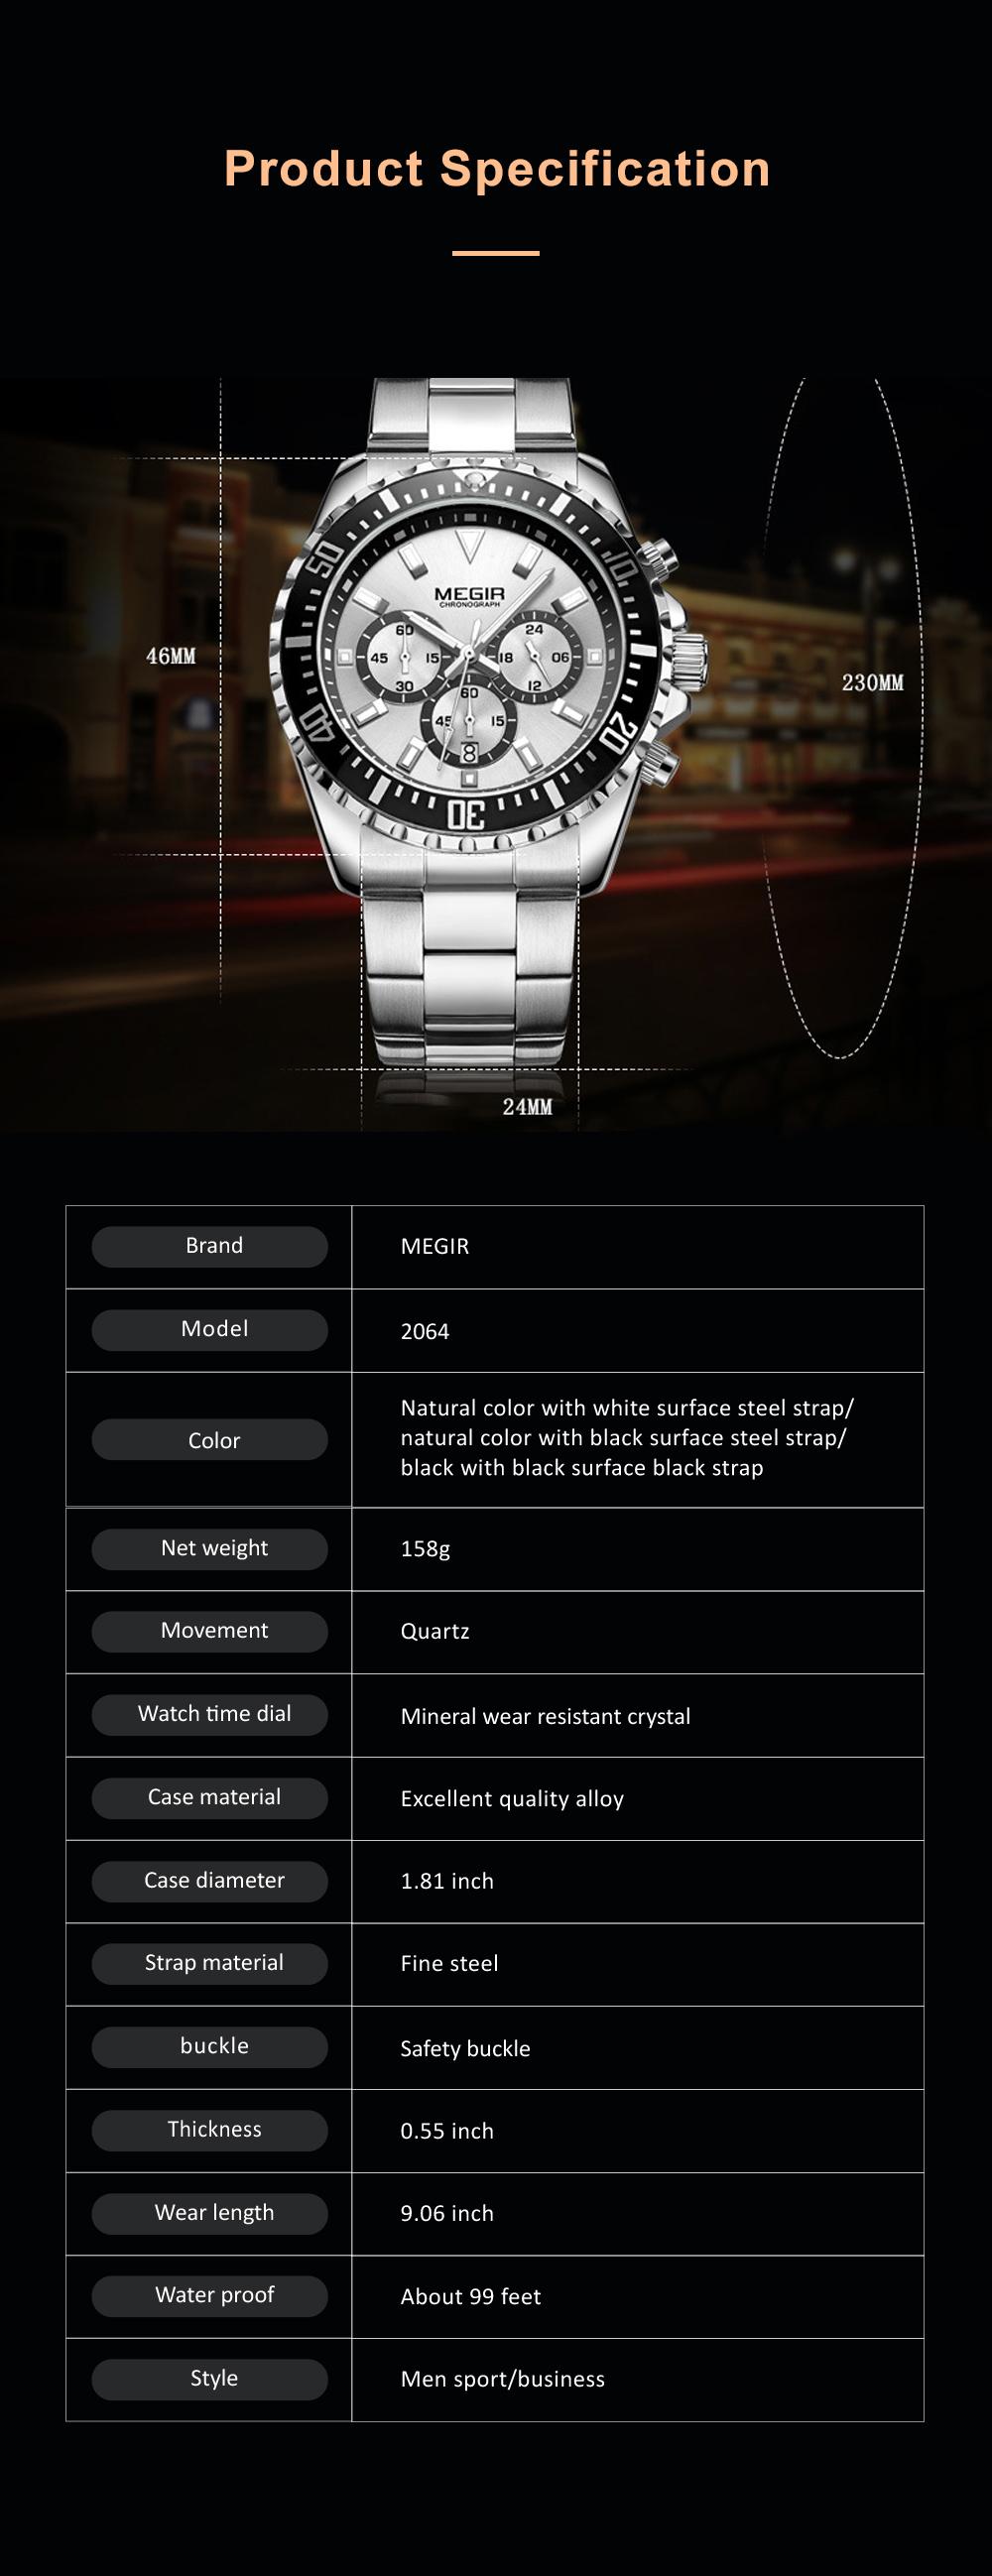 Men's Multifunctional Wrist Watch with Luminous Display and Quartz Movement Fashion Waterproof Watch 8